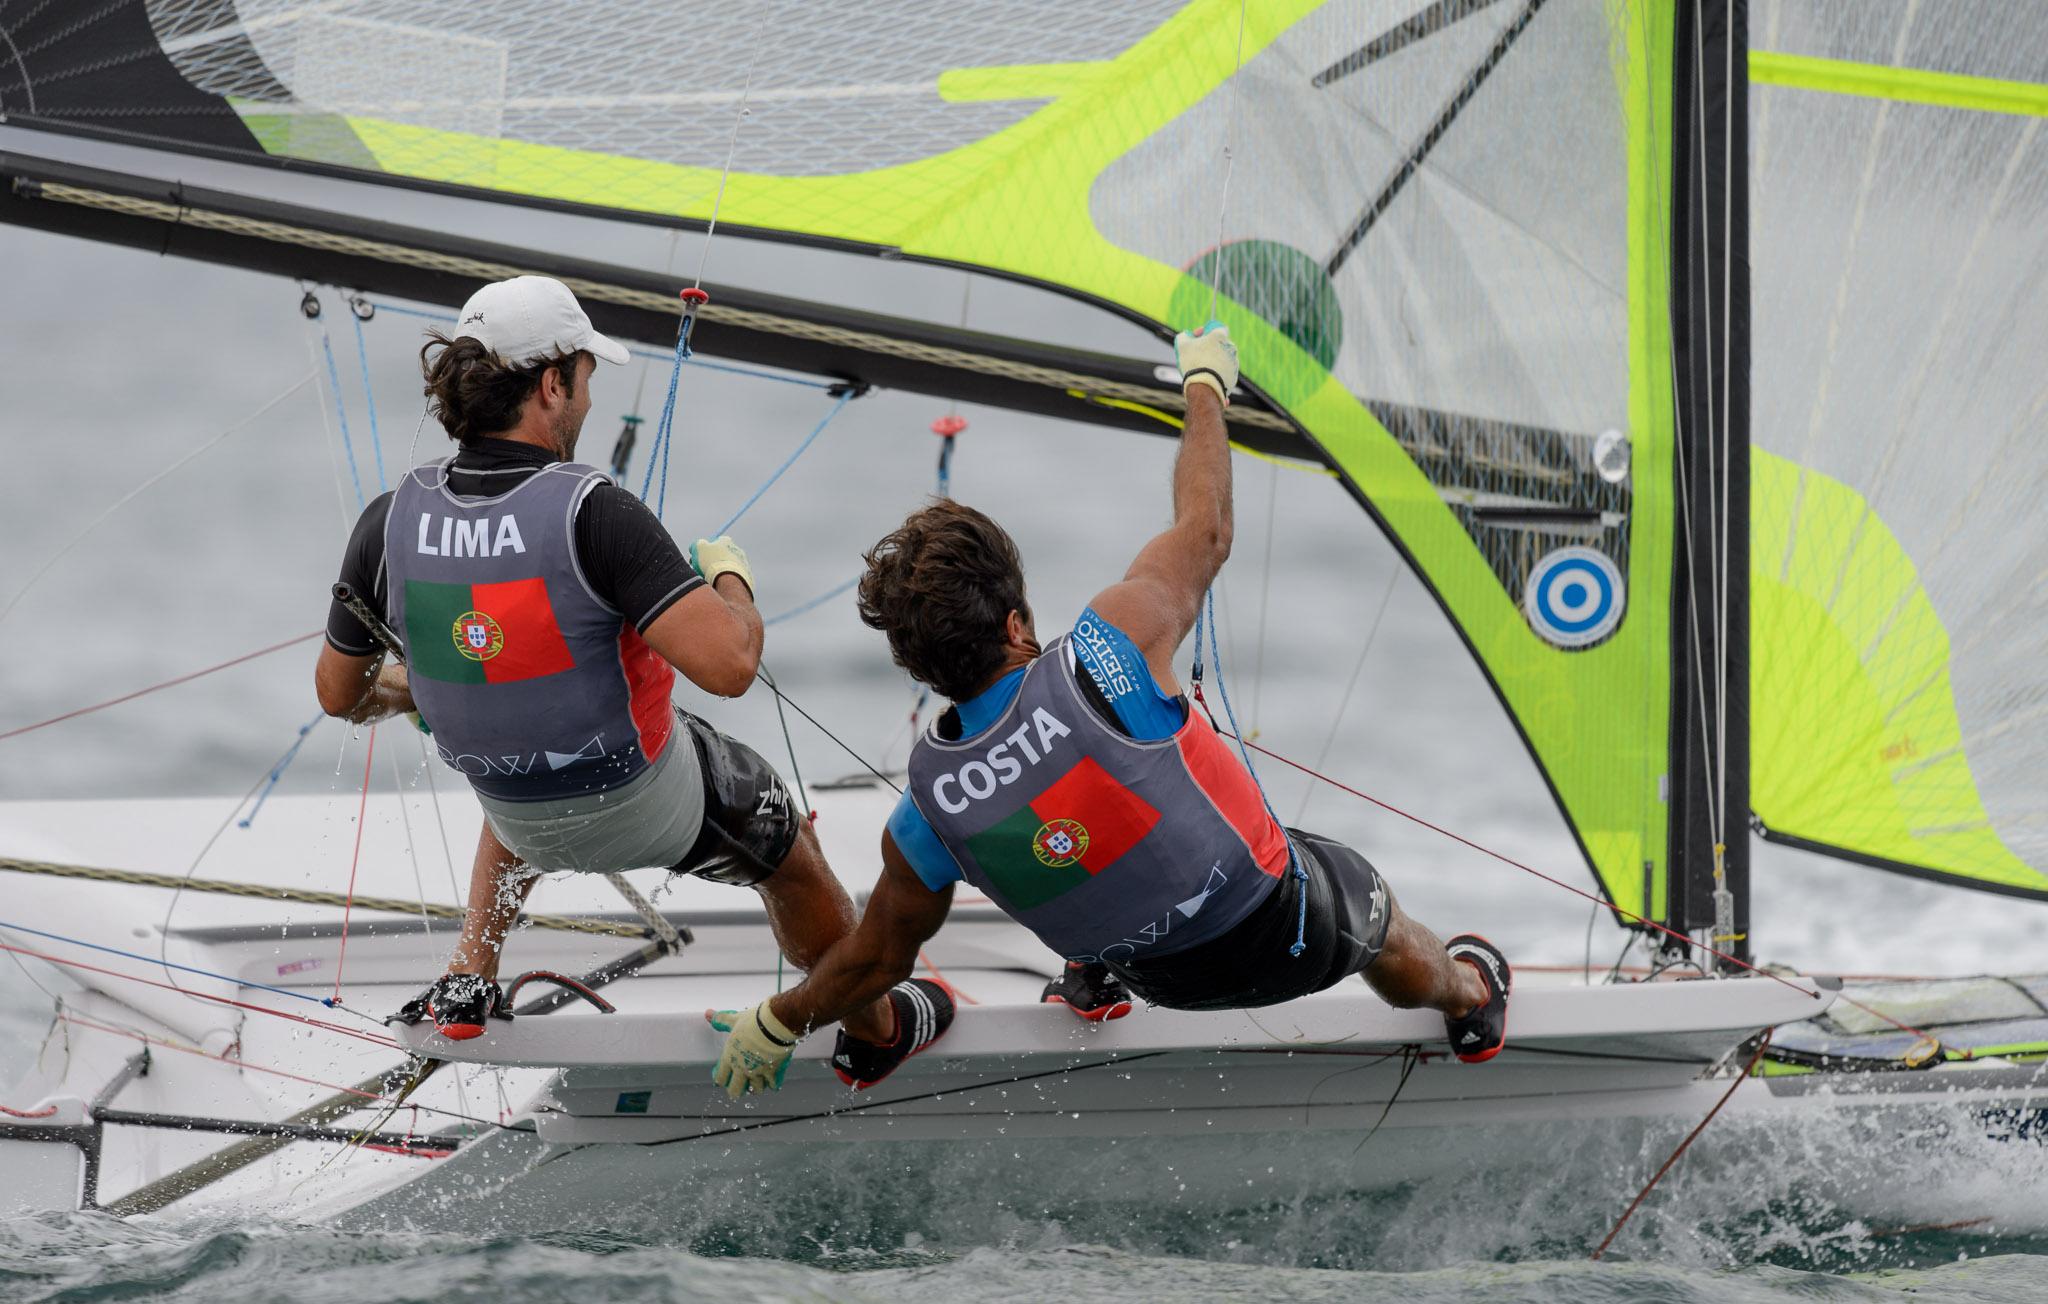 Day 5 of the Santander 2014 ISAF Sailing World Championships